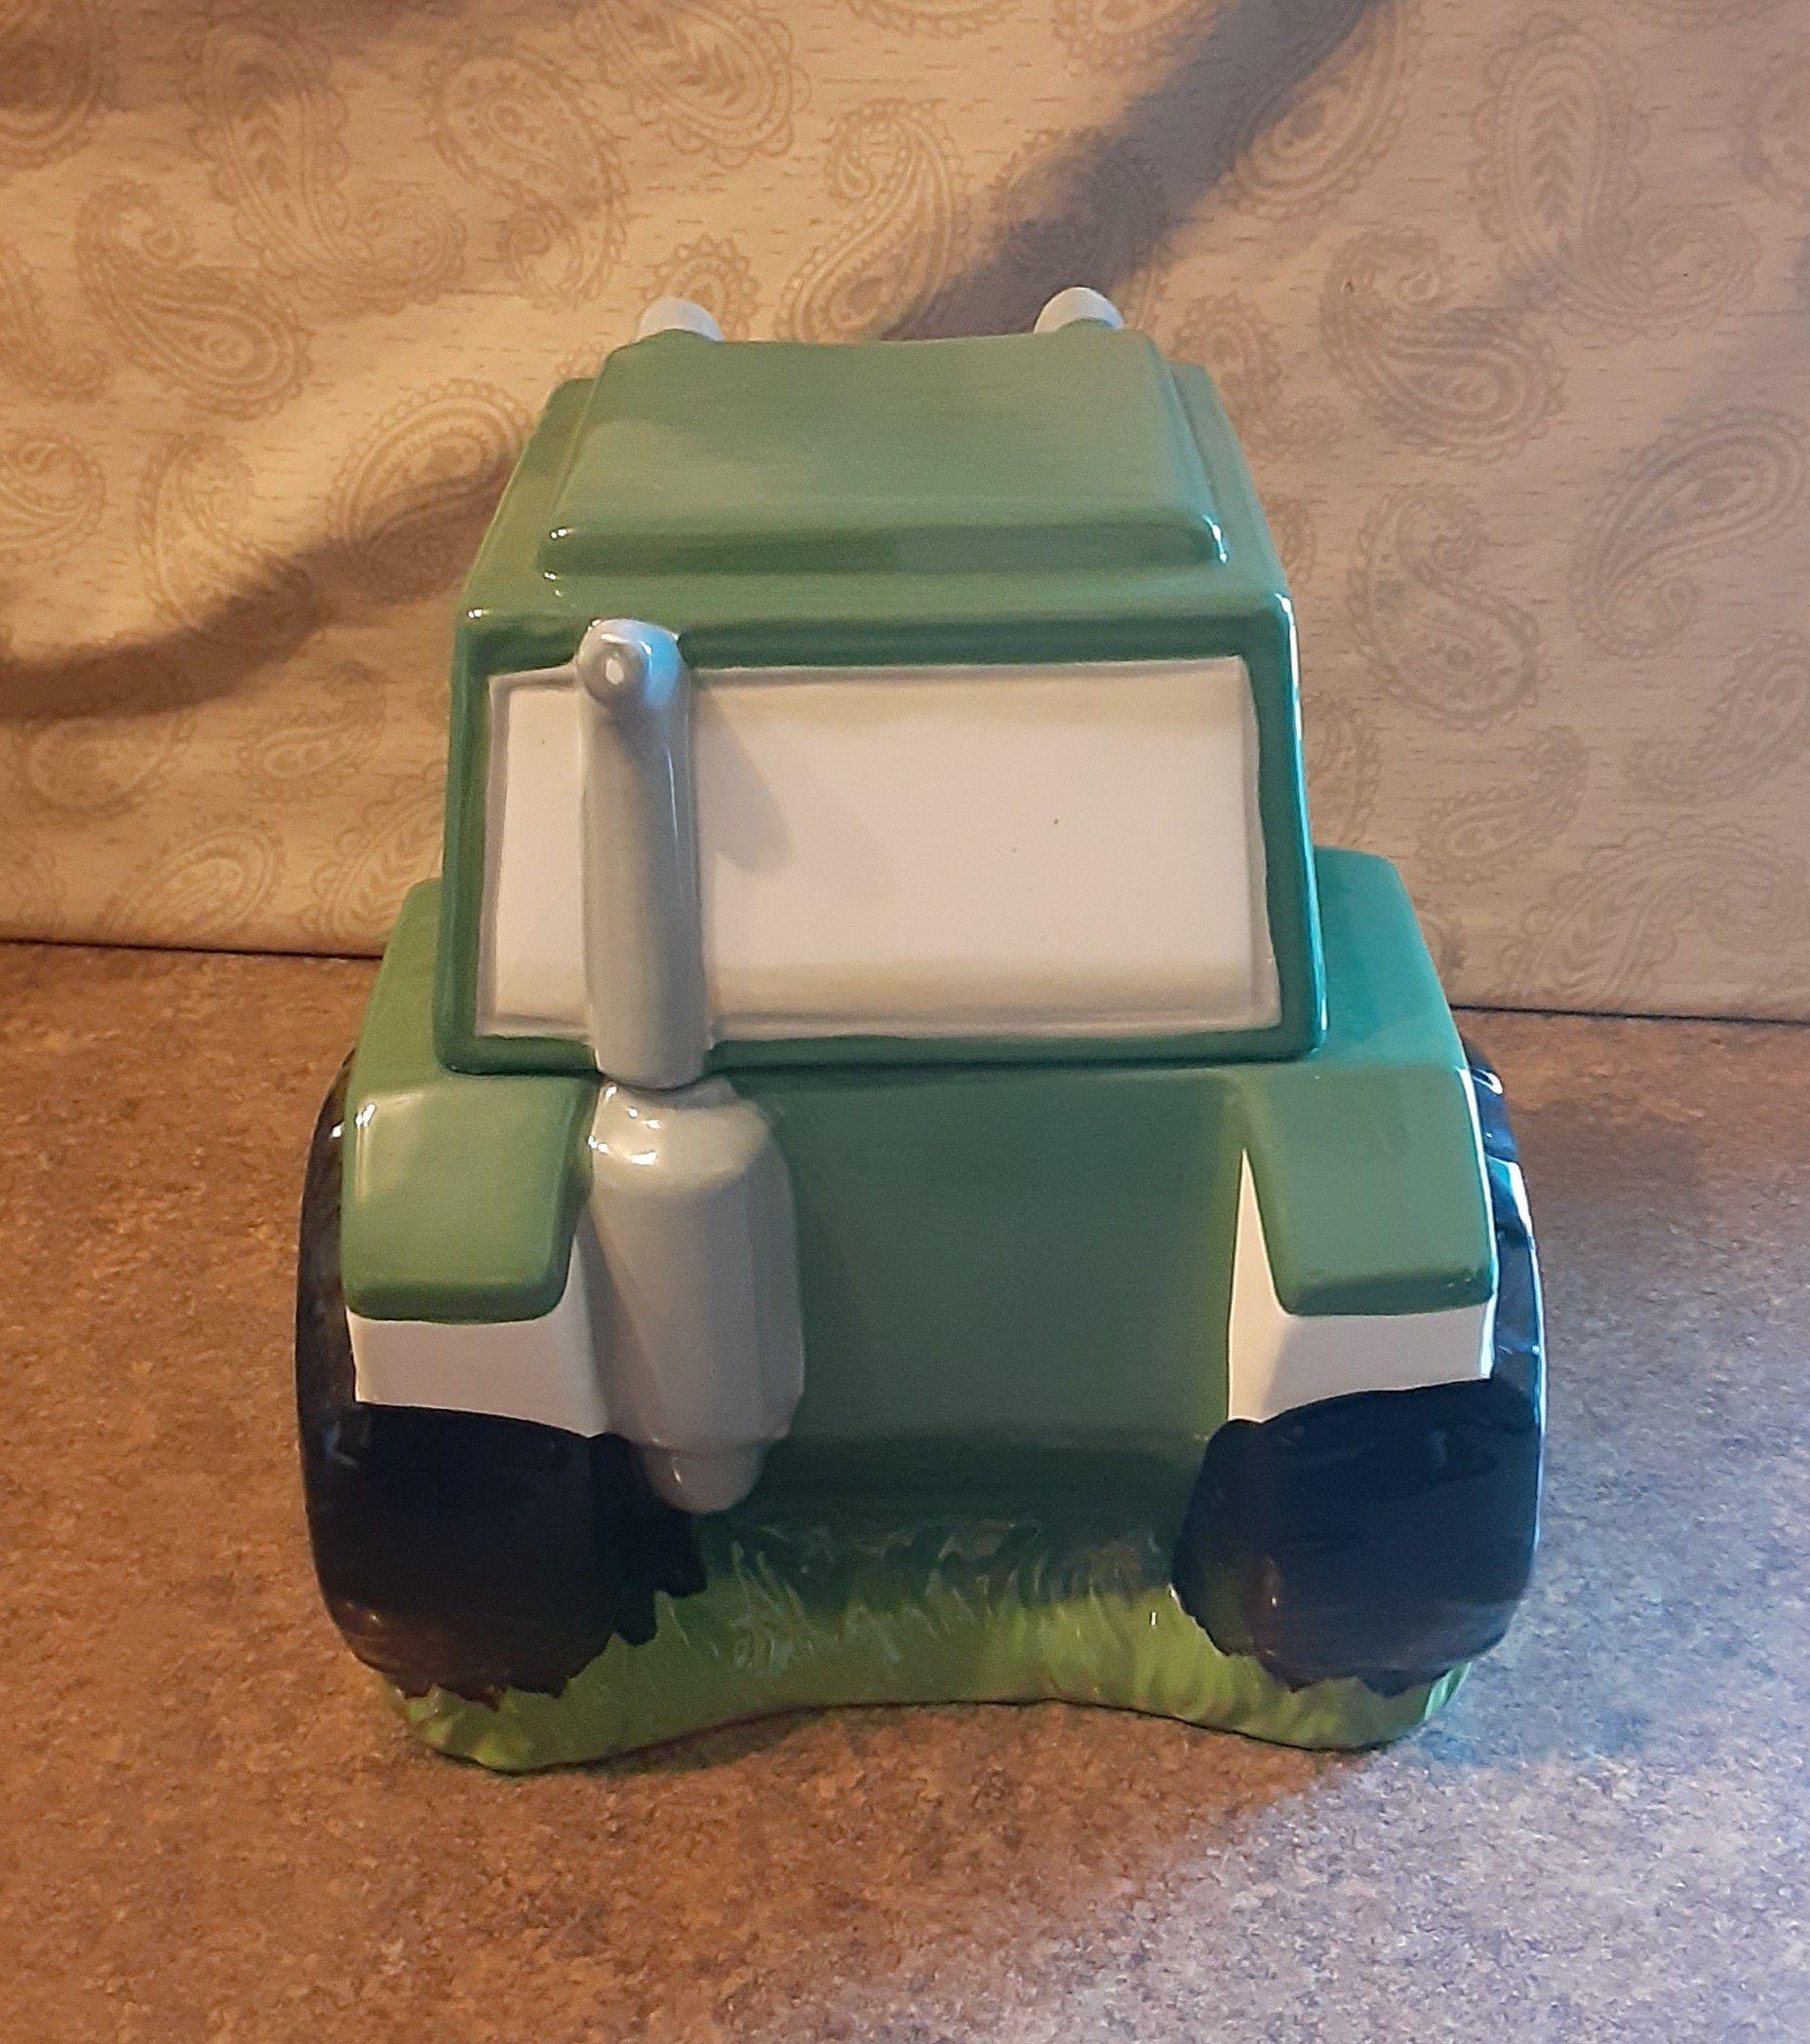 Decorative Farm Tractor Ceramic Display